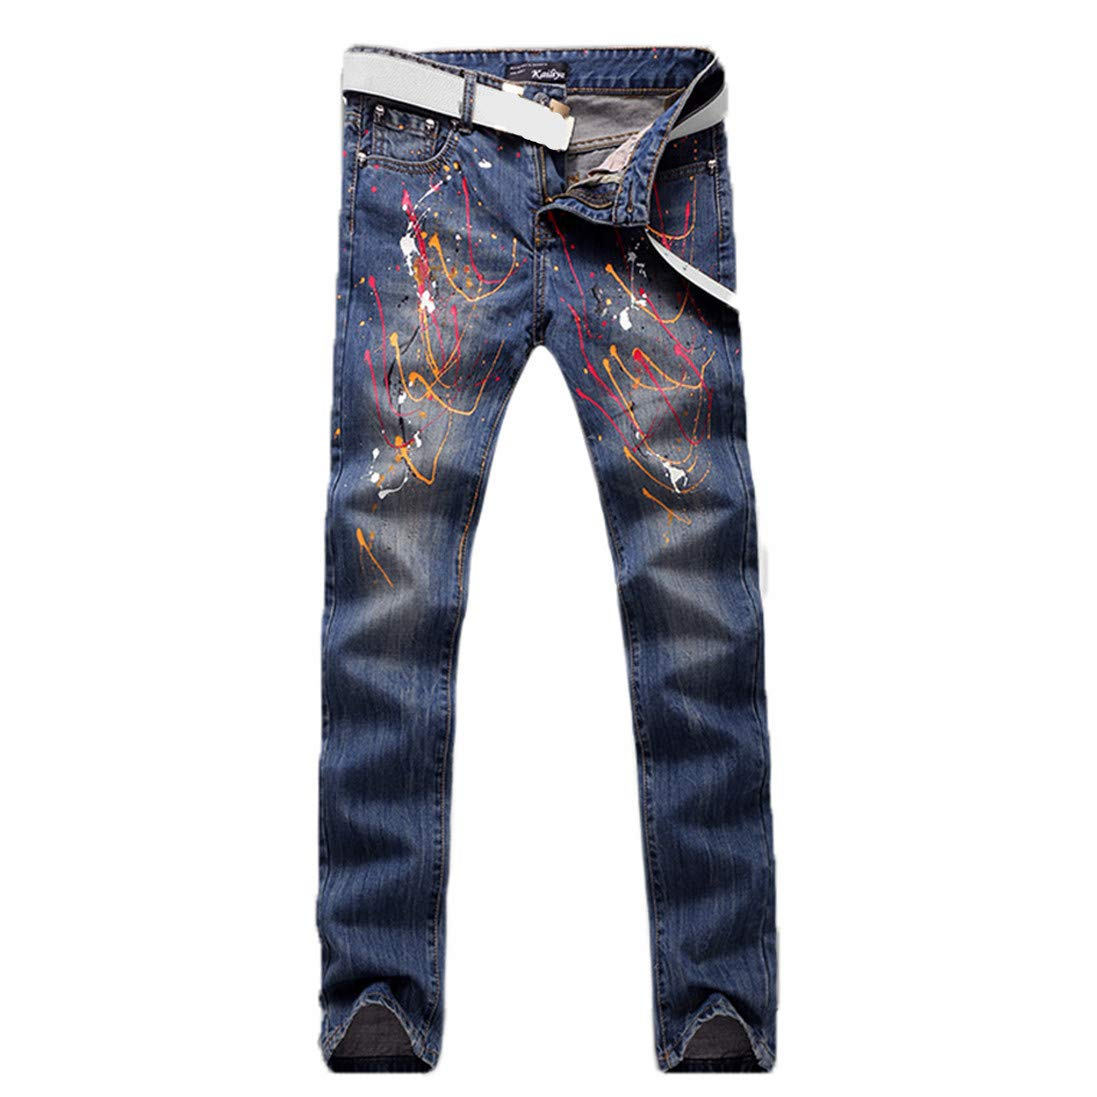 Futtle Mens Colorful Printed Pants Freedom Individuality Slim Straigh Leg Indigo Jeans